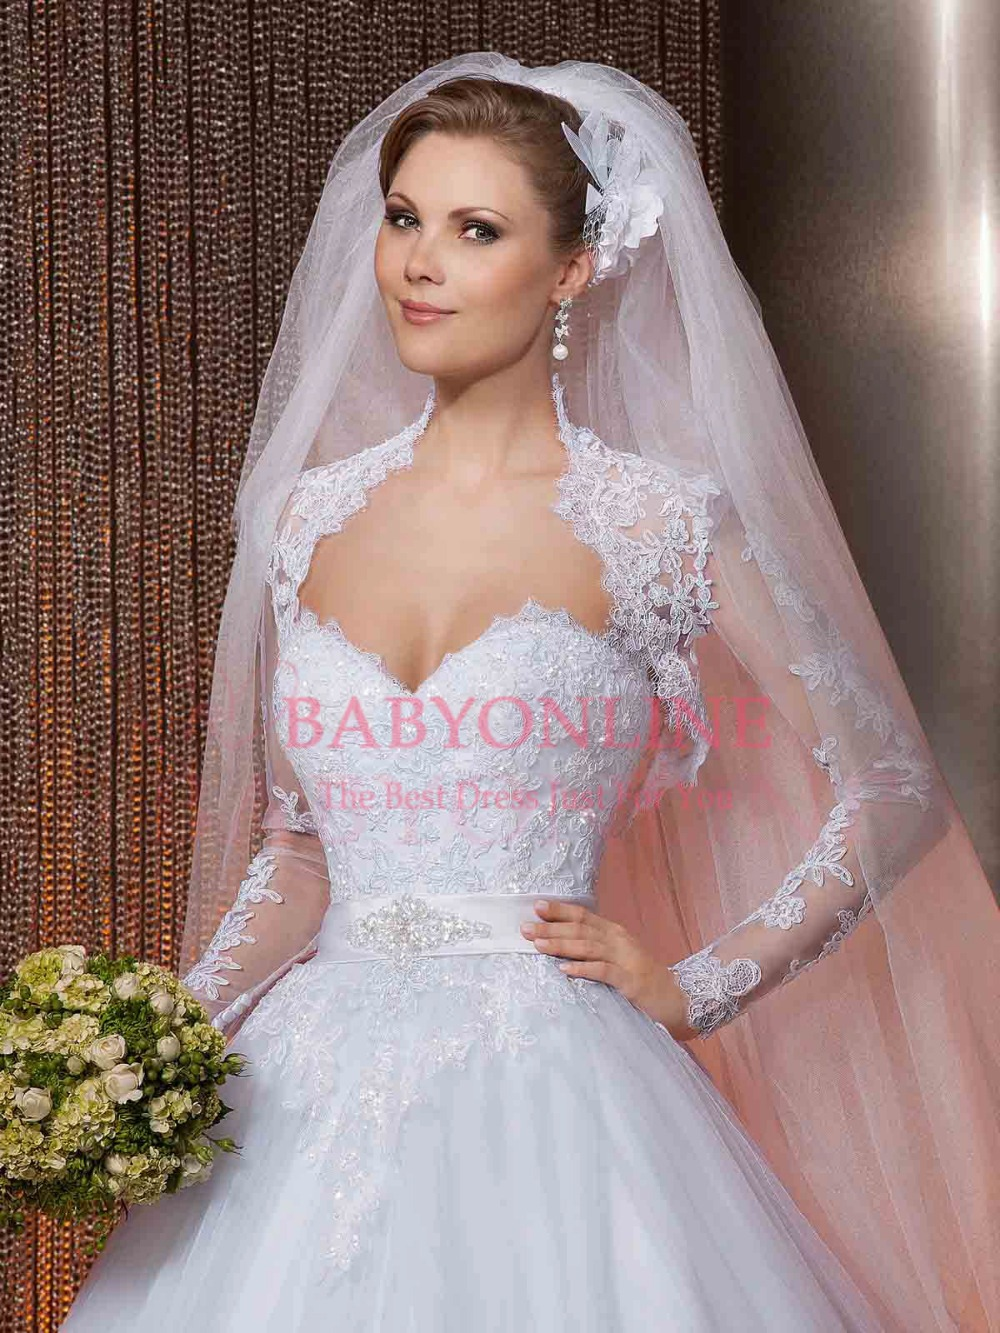 Princess Ball Gown Wedding Dresses 2014 | Dress images